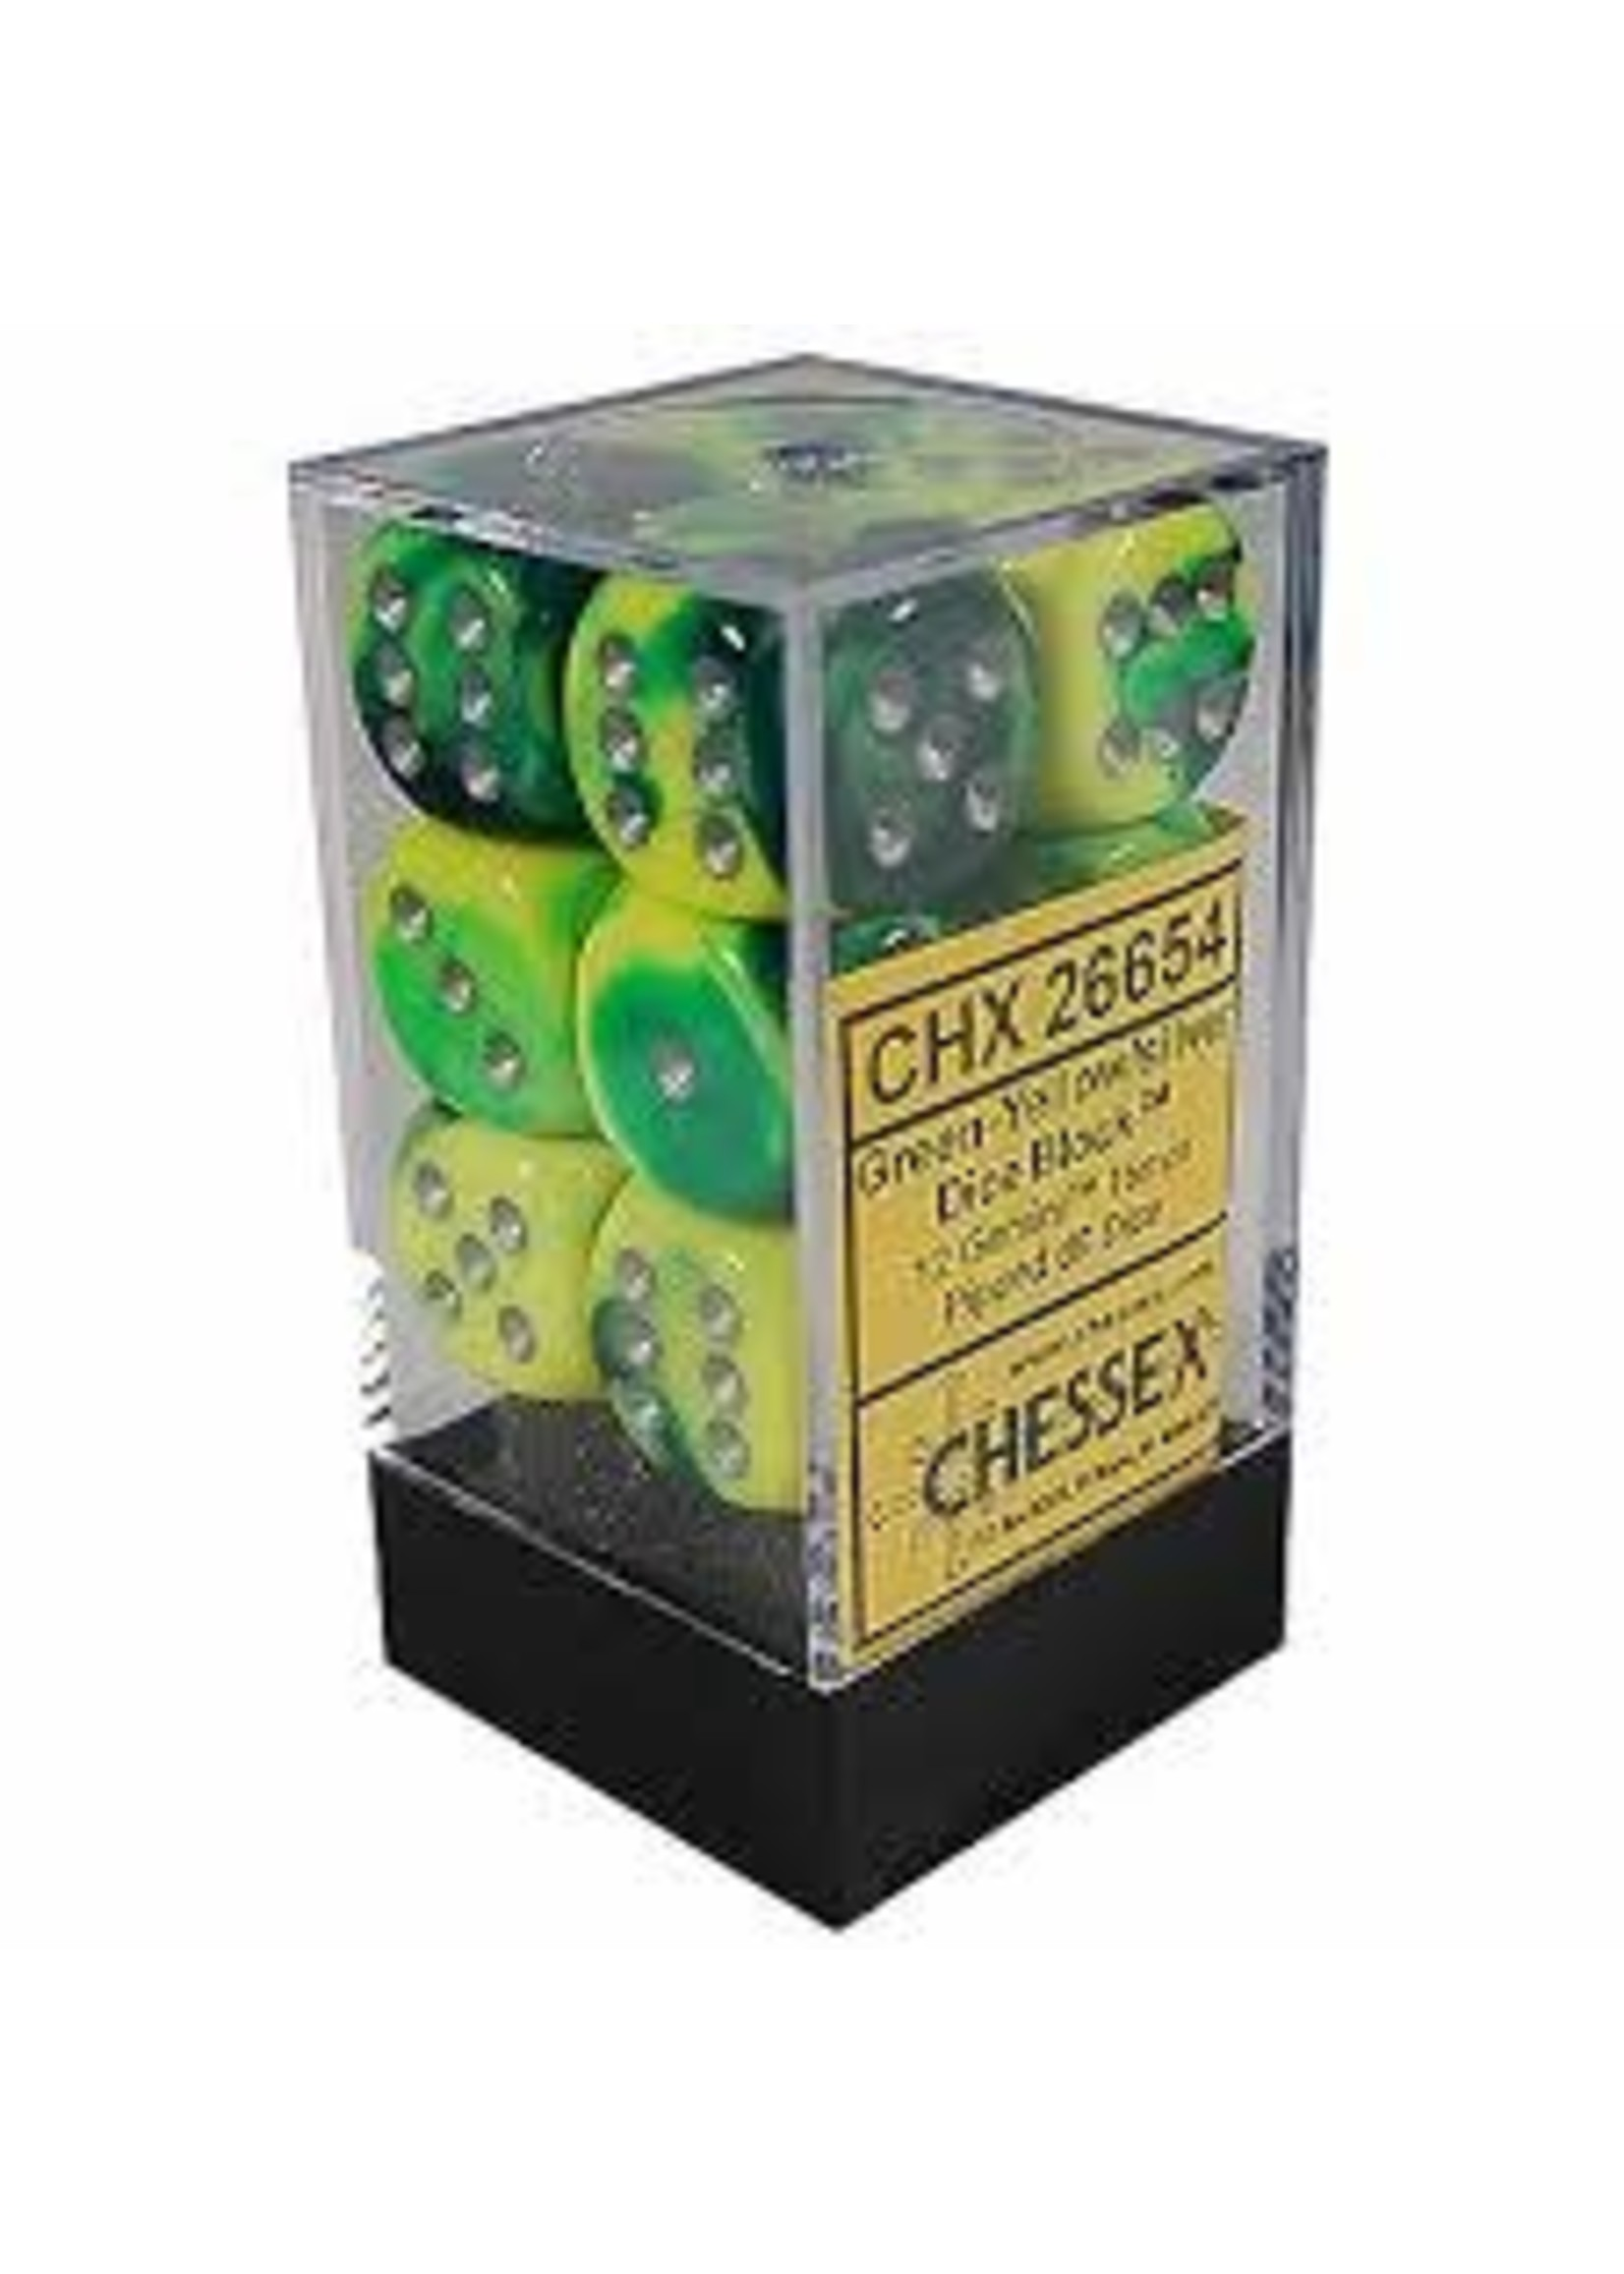 Chessex d6 Cube 16mm Gemini Green & Yellow w/ Silver (12)